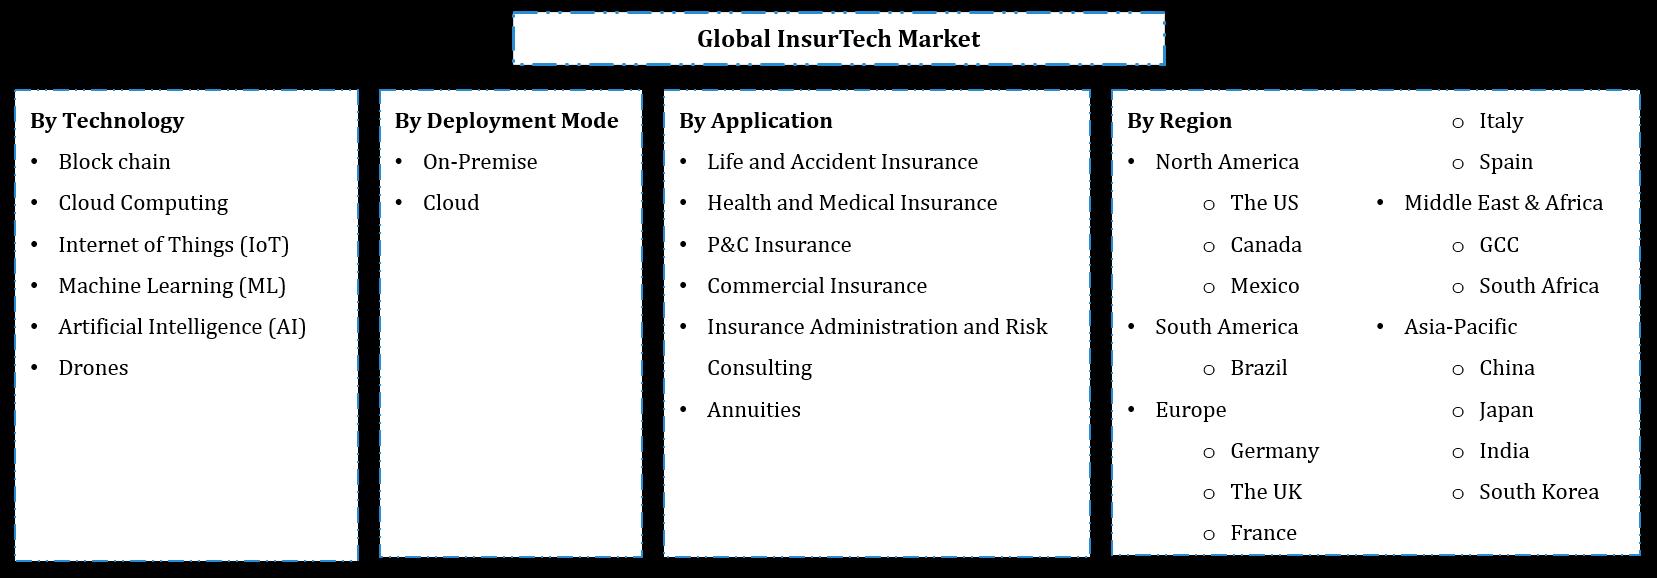 Global InsurTech Market Segmentation